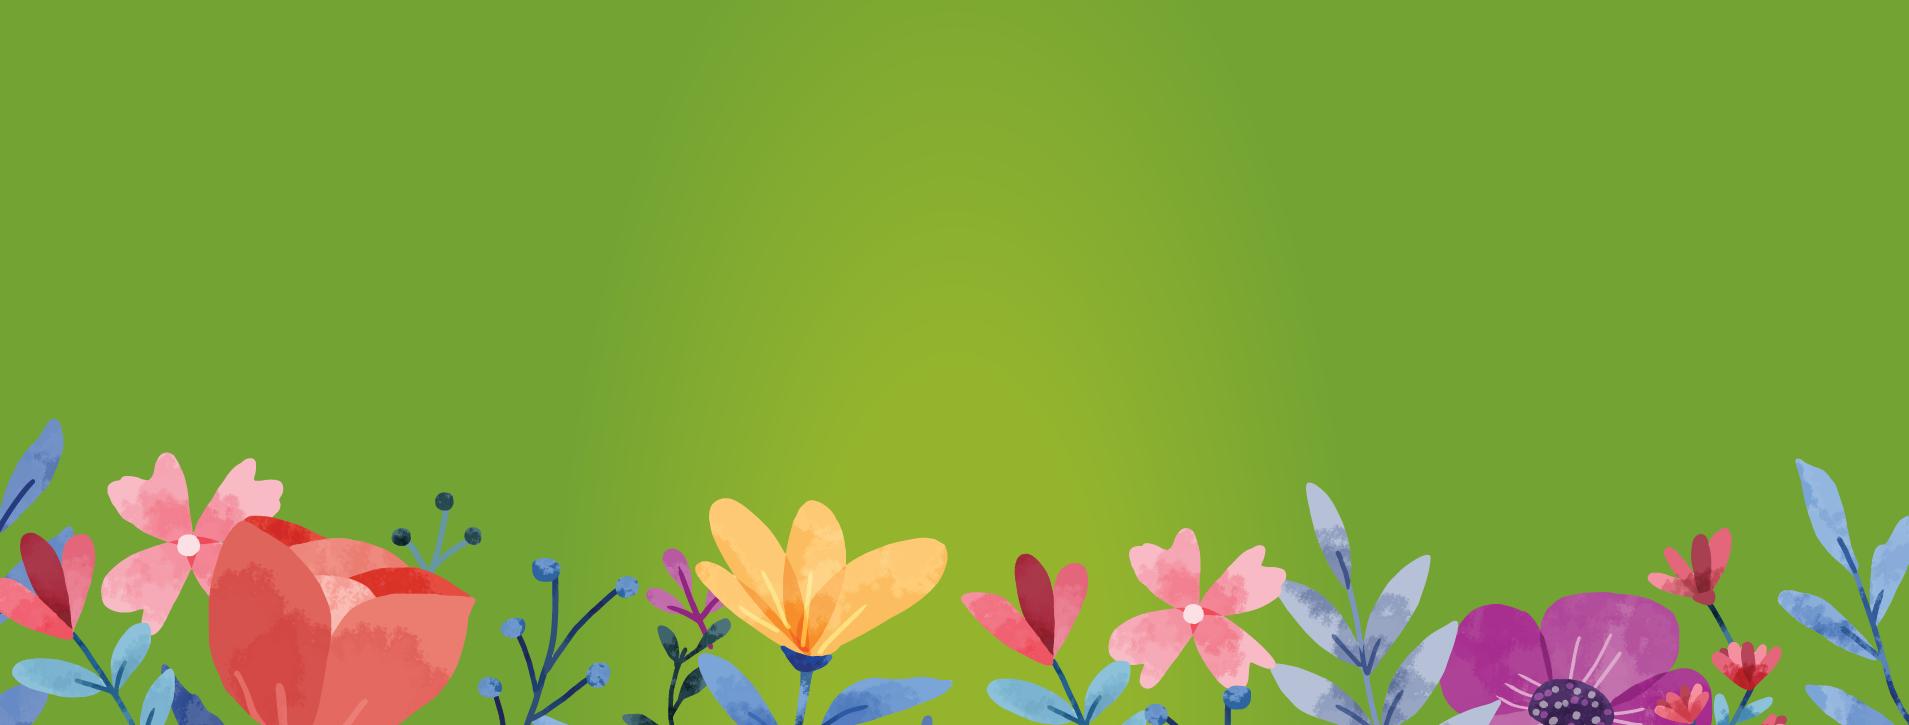 2021 green background v2